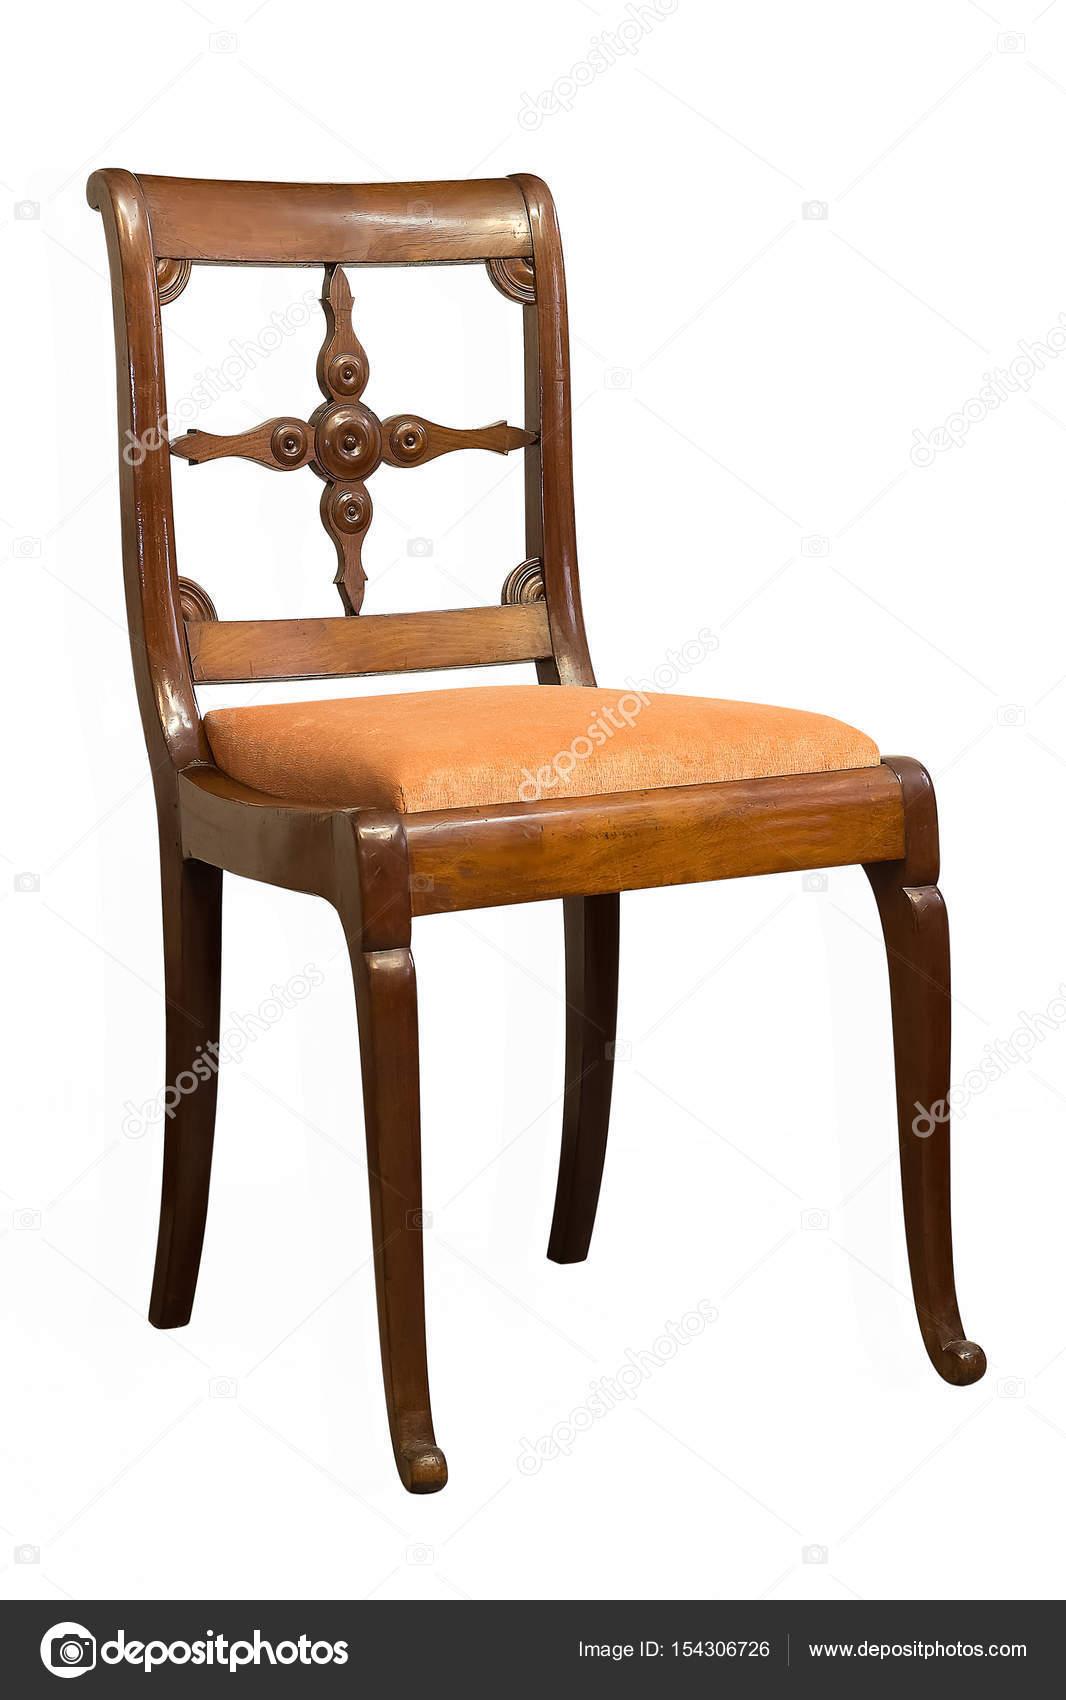 Antike Biedermeier Stuhl Mit Holz Schnitzerei Stockfoto